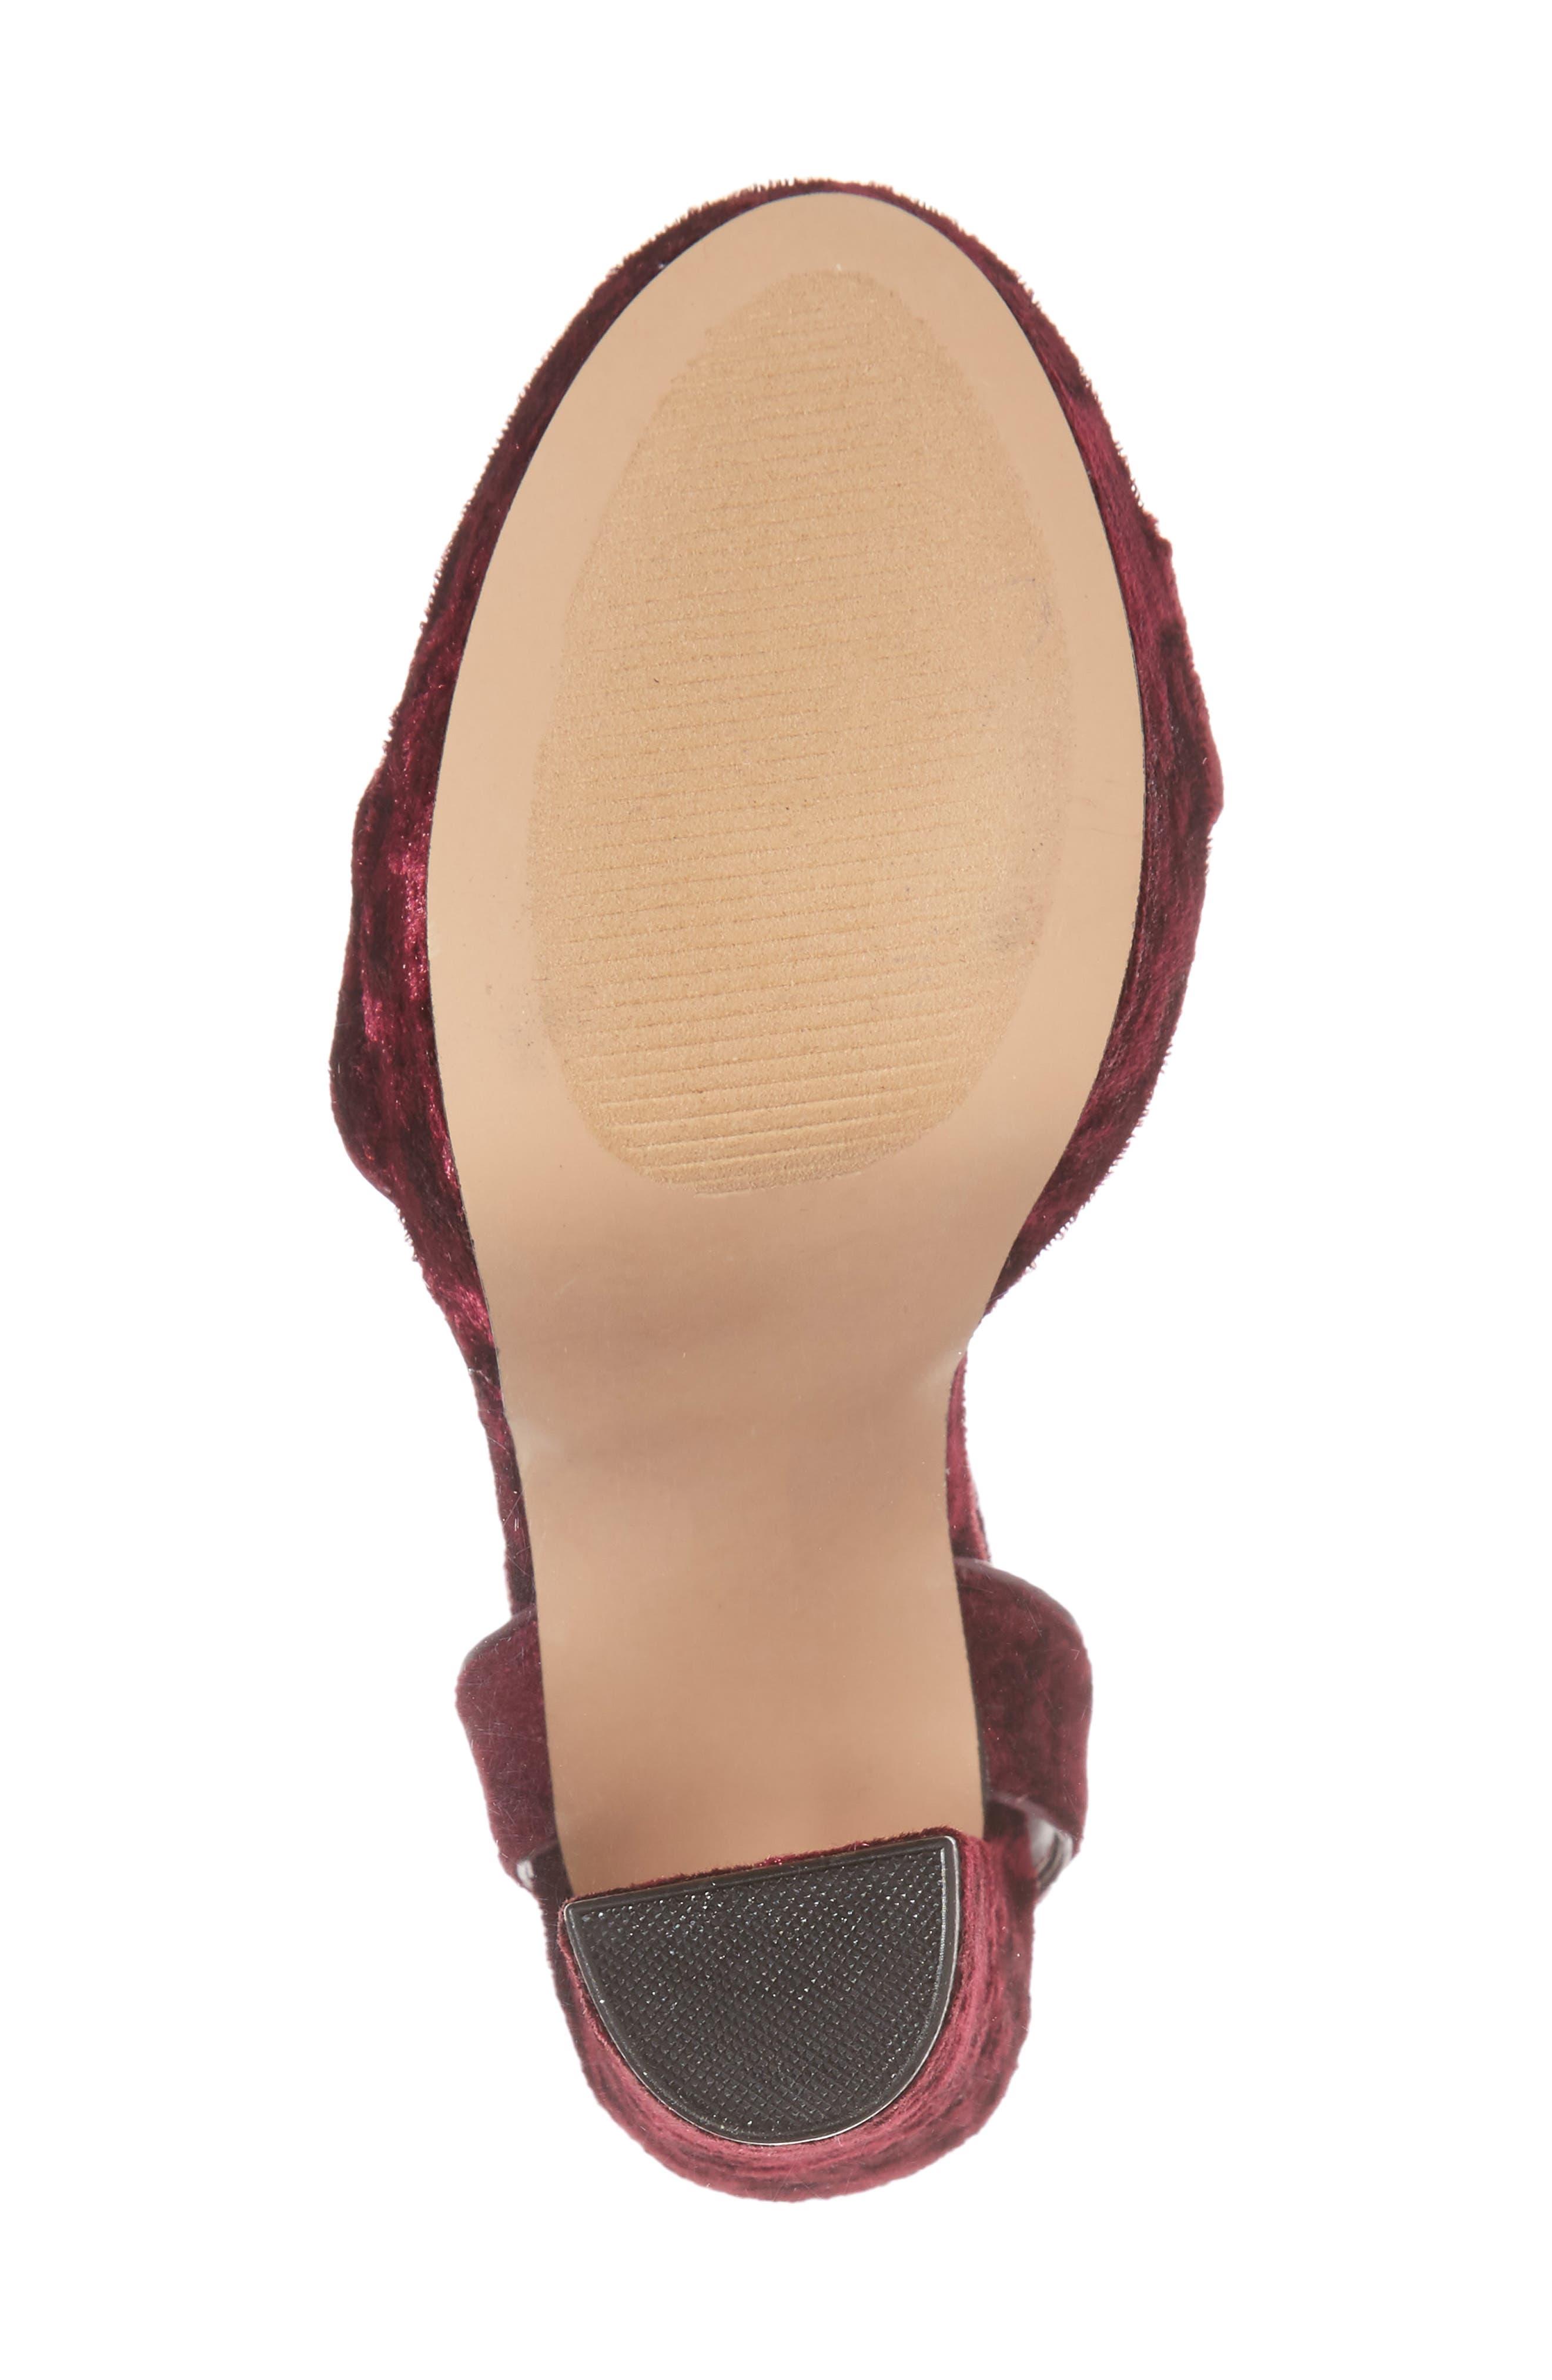 Insomnia Platform Ankle Strap Sandal,                             Alternate thumbnail 6, color,                             Burgundy Fabric